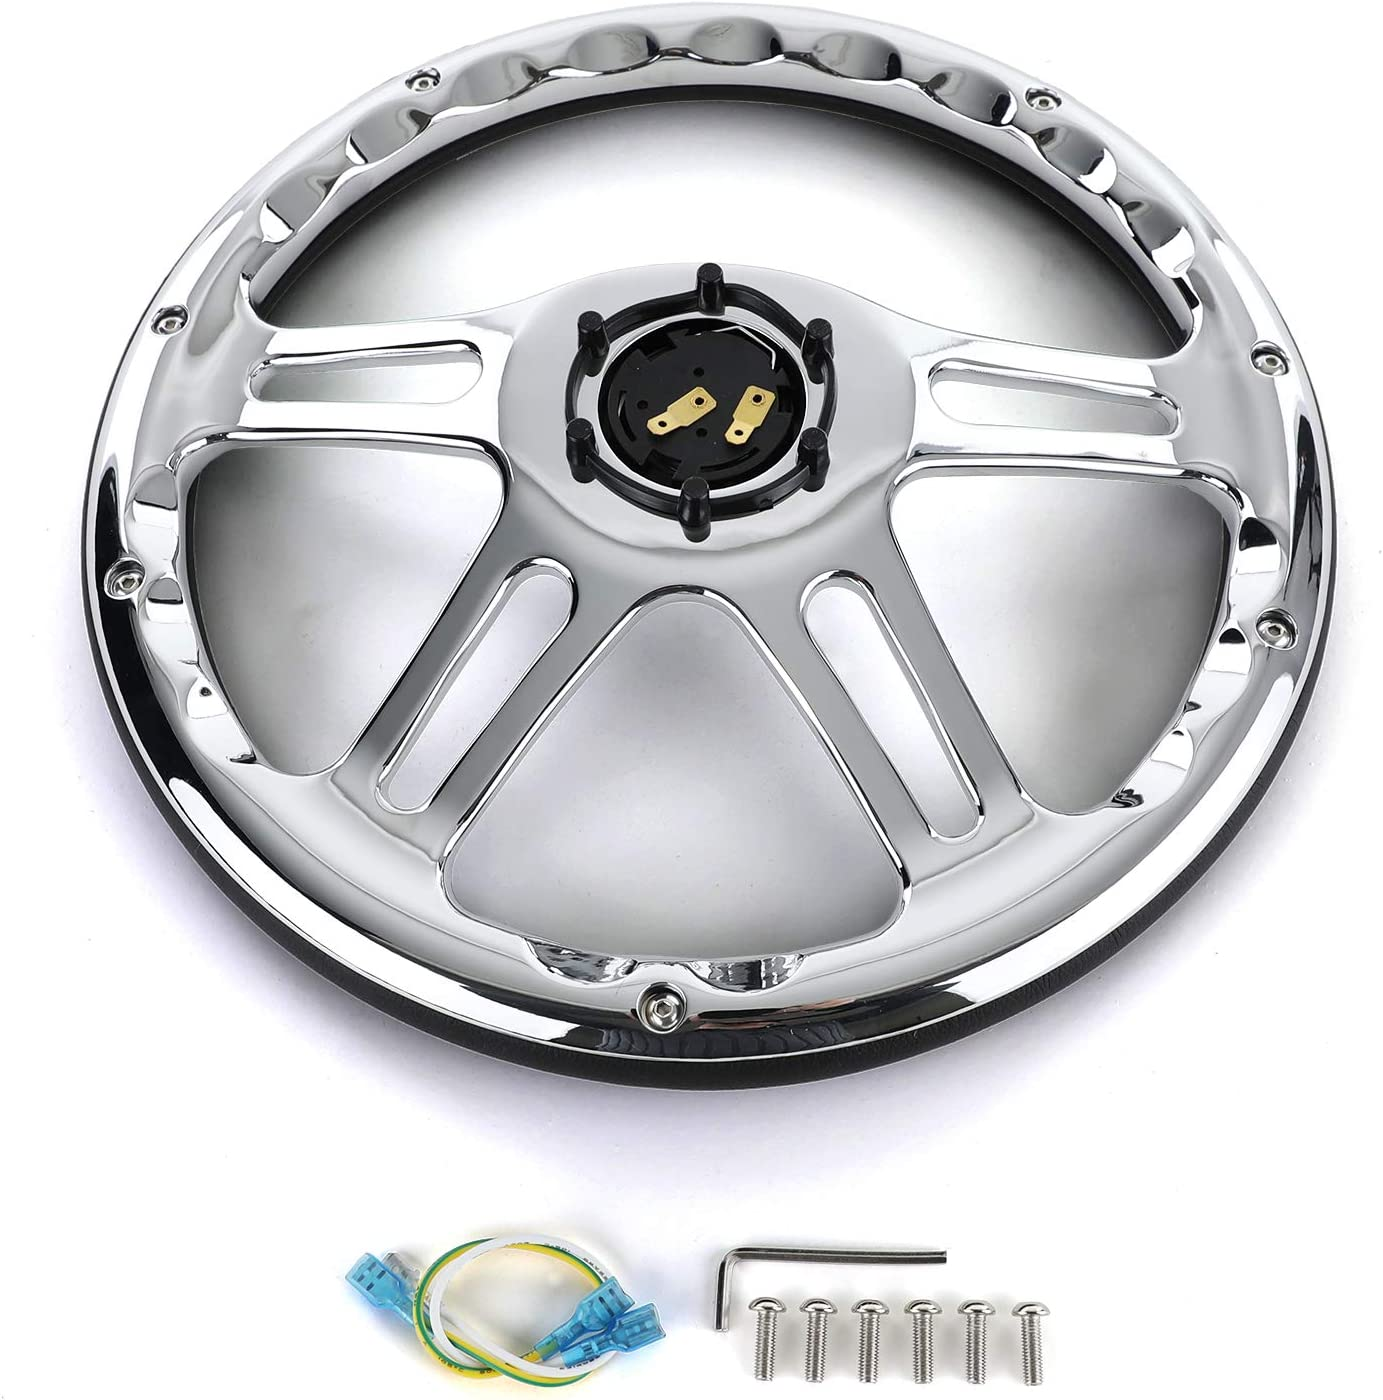 Tenzo-R 37982 Sport Lenkrad Exclusive 2 Leder Schwarz Chrom 340mm universal f/ür Momo Sparco